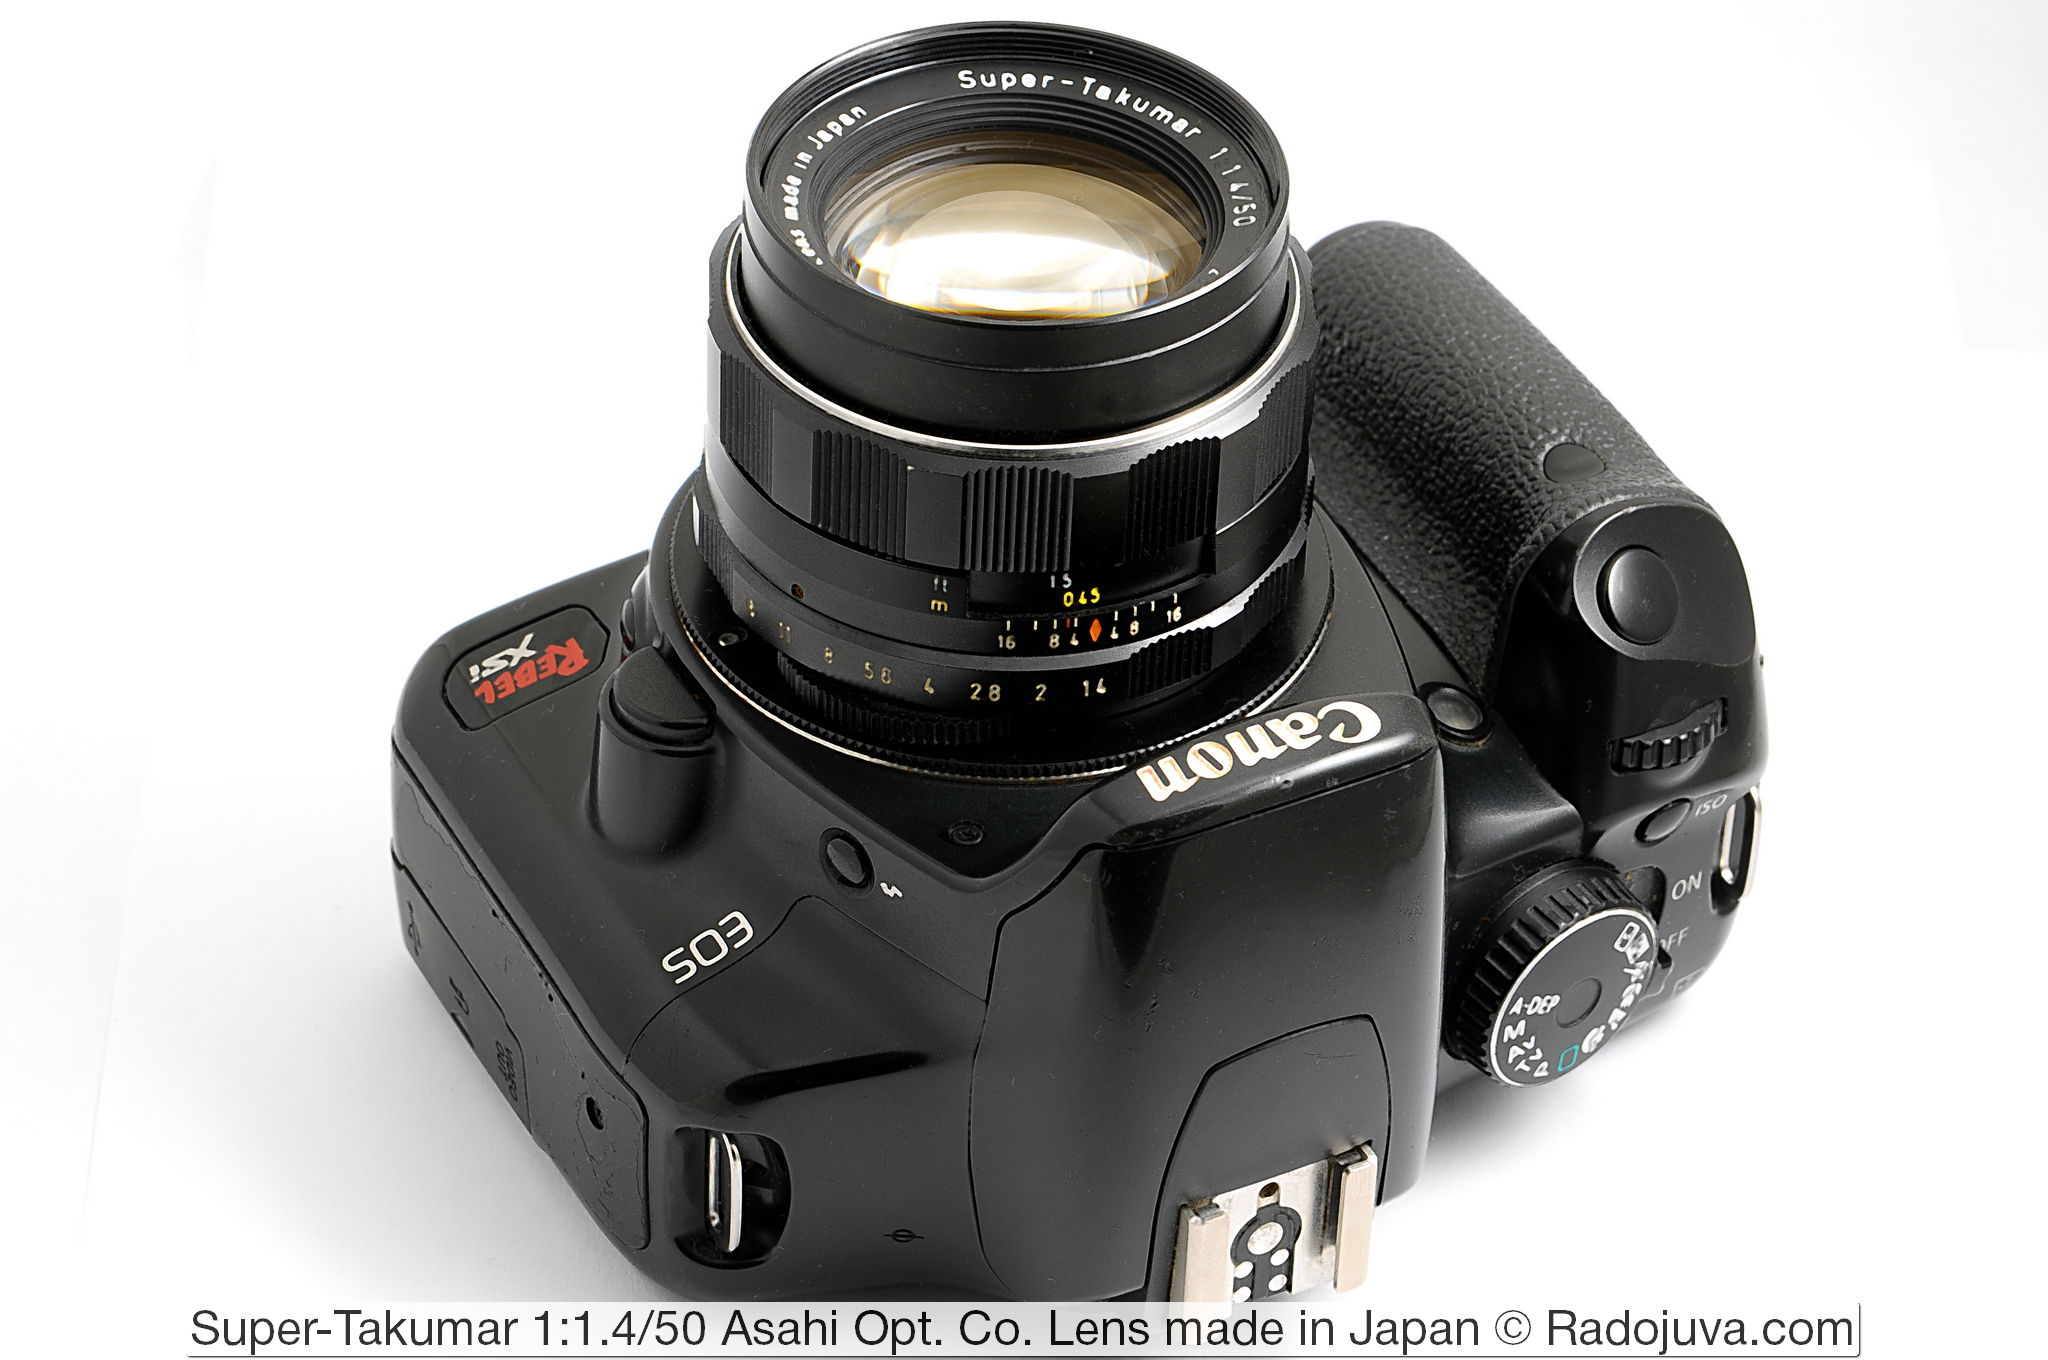 Super-Takumar 1:1.4/50 Asahi Opt. Co. Lens made in Japan